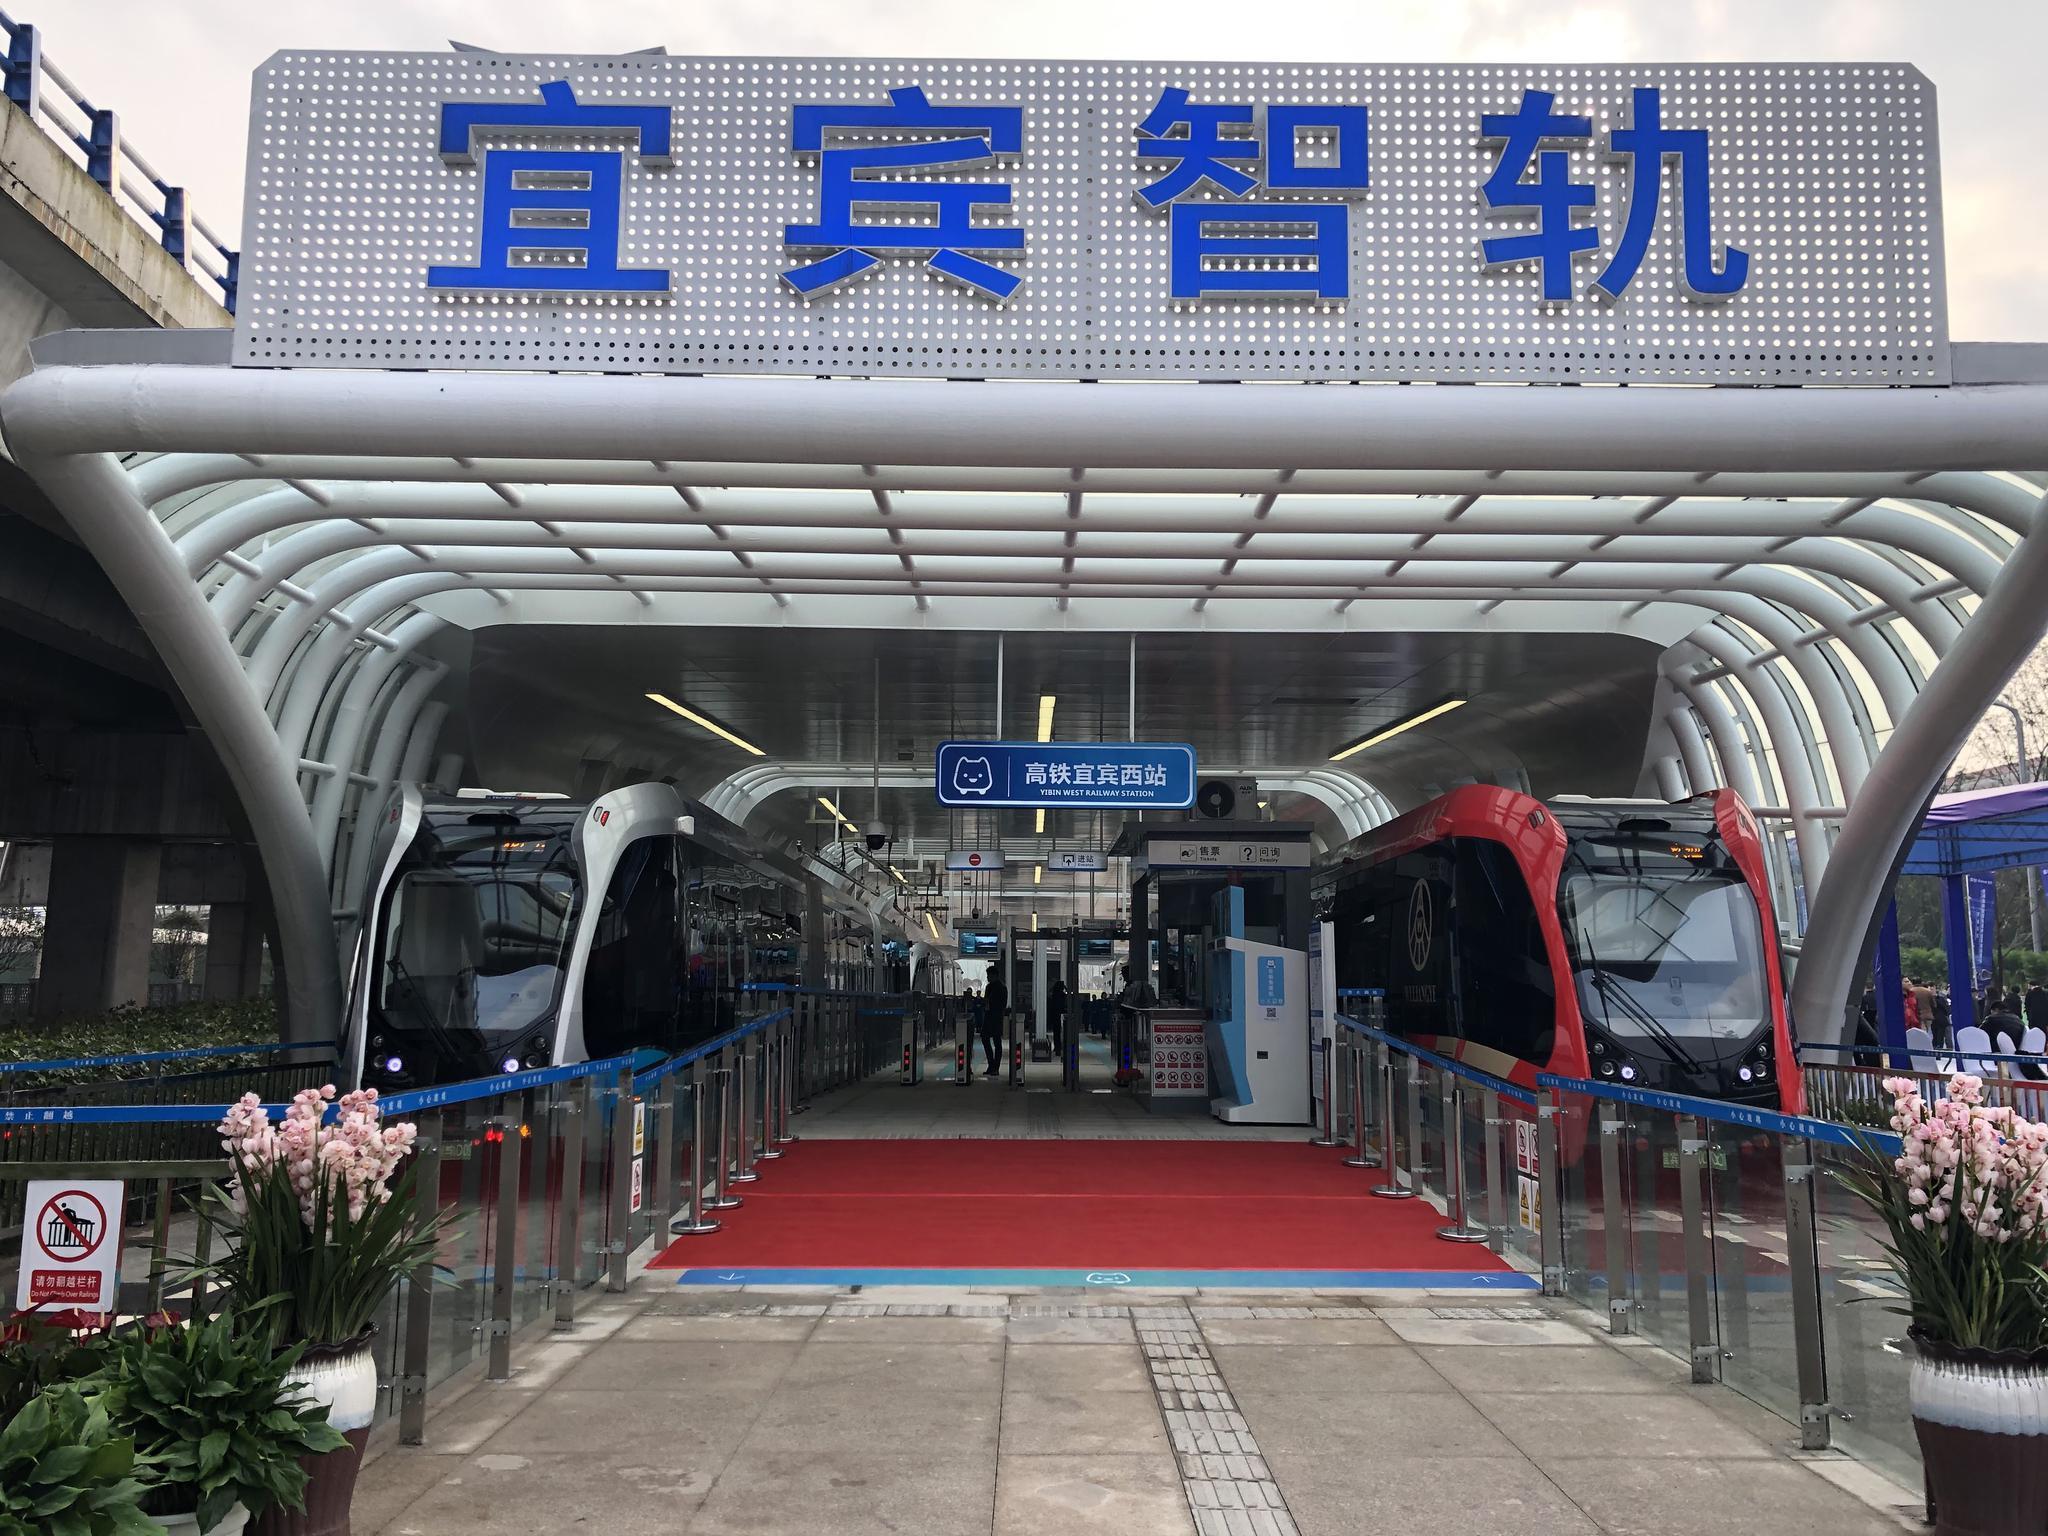 http://www.scgxky.com/dushujiaoyu/85461.html